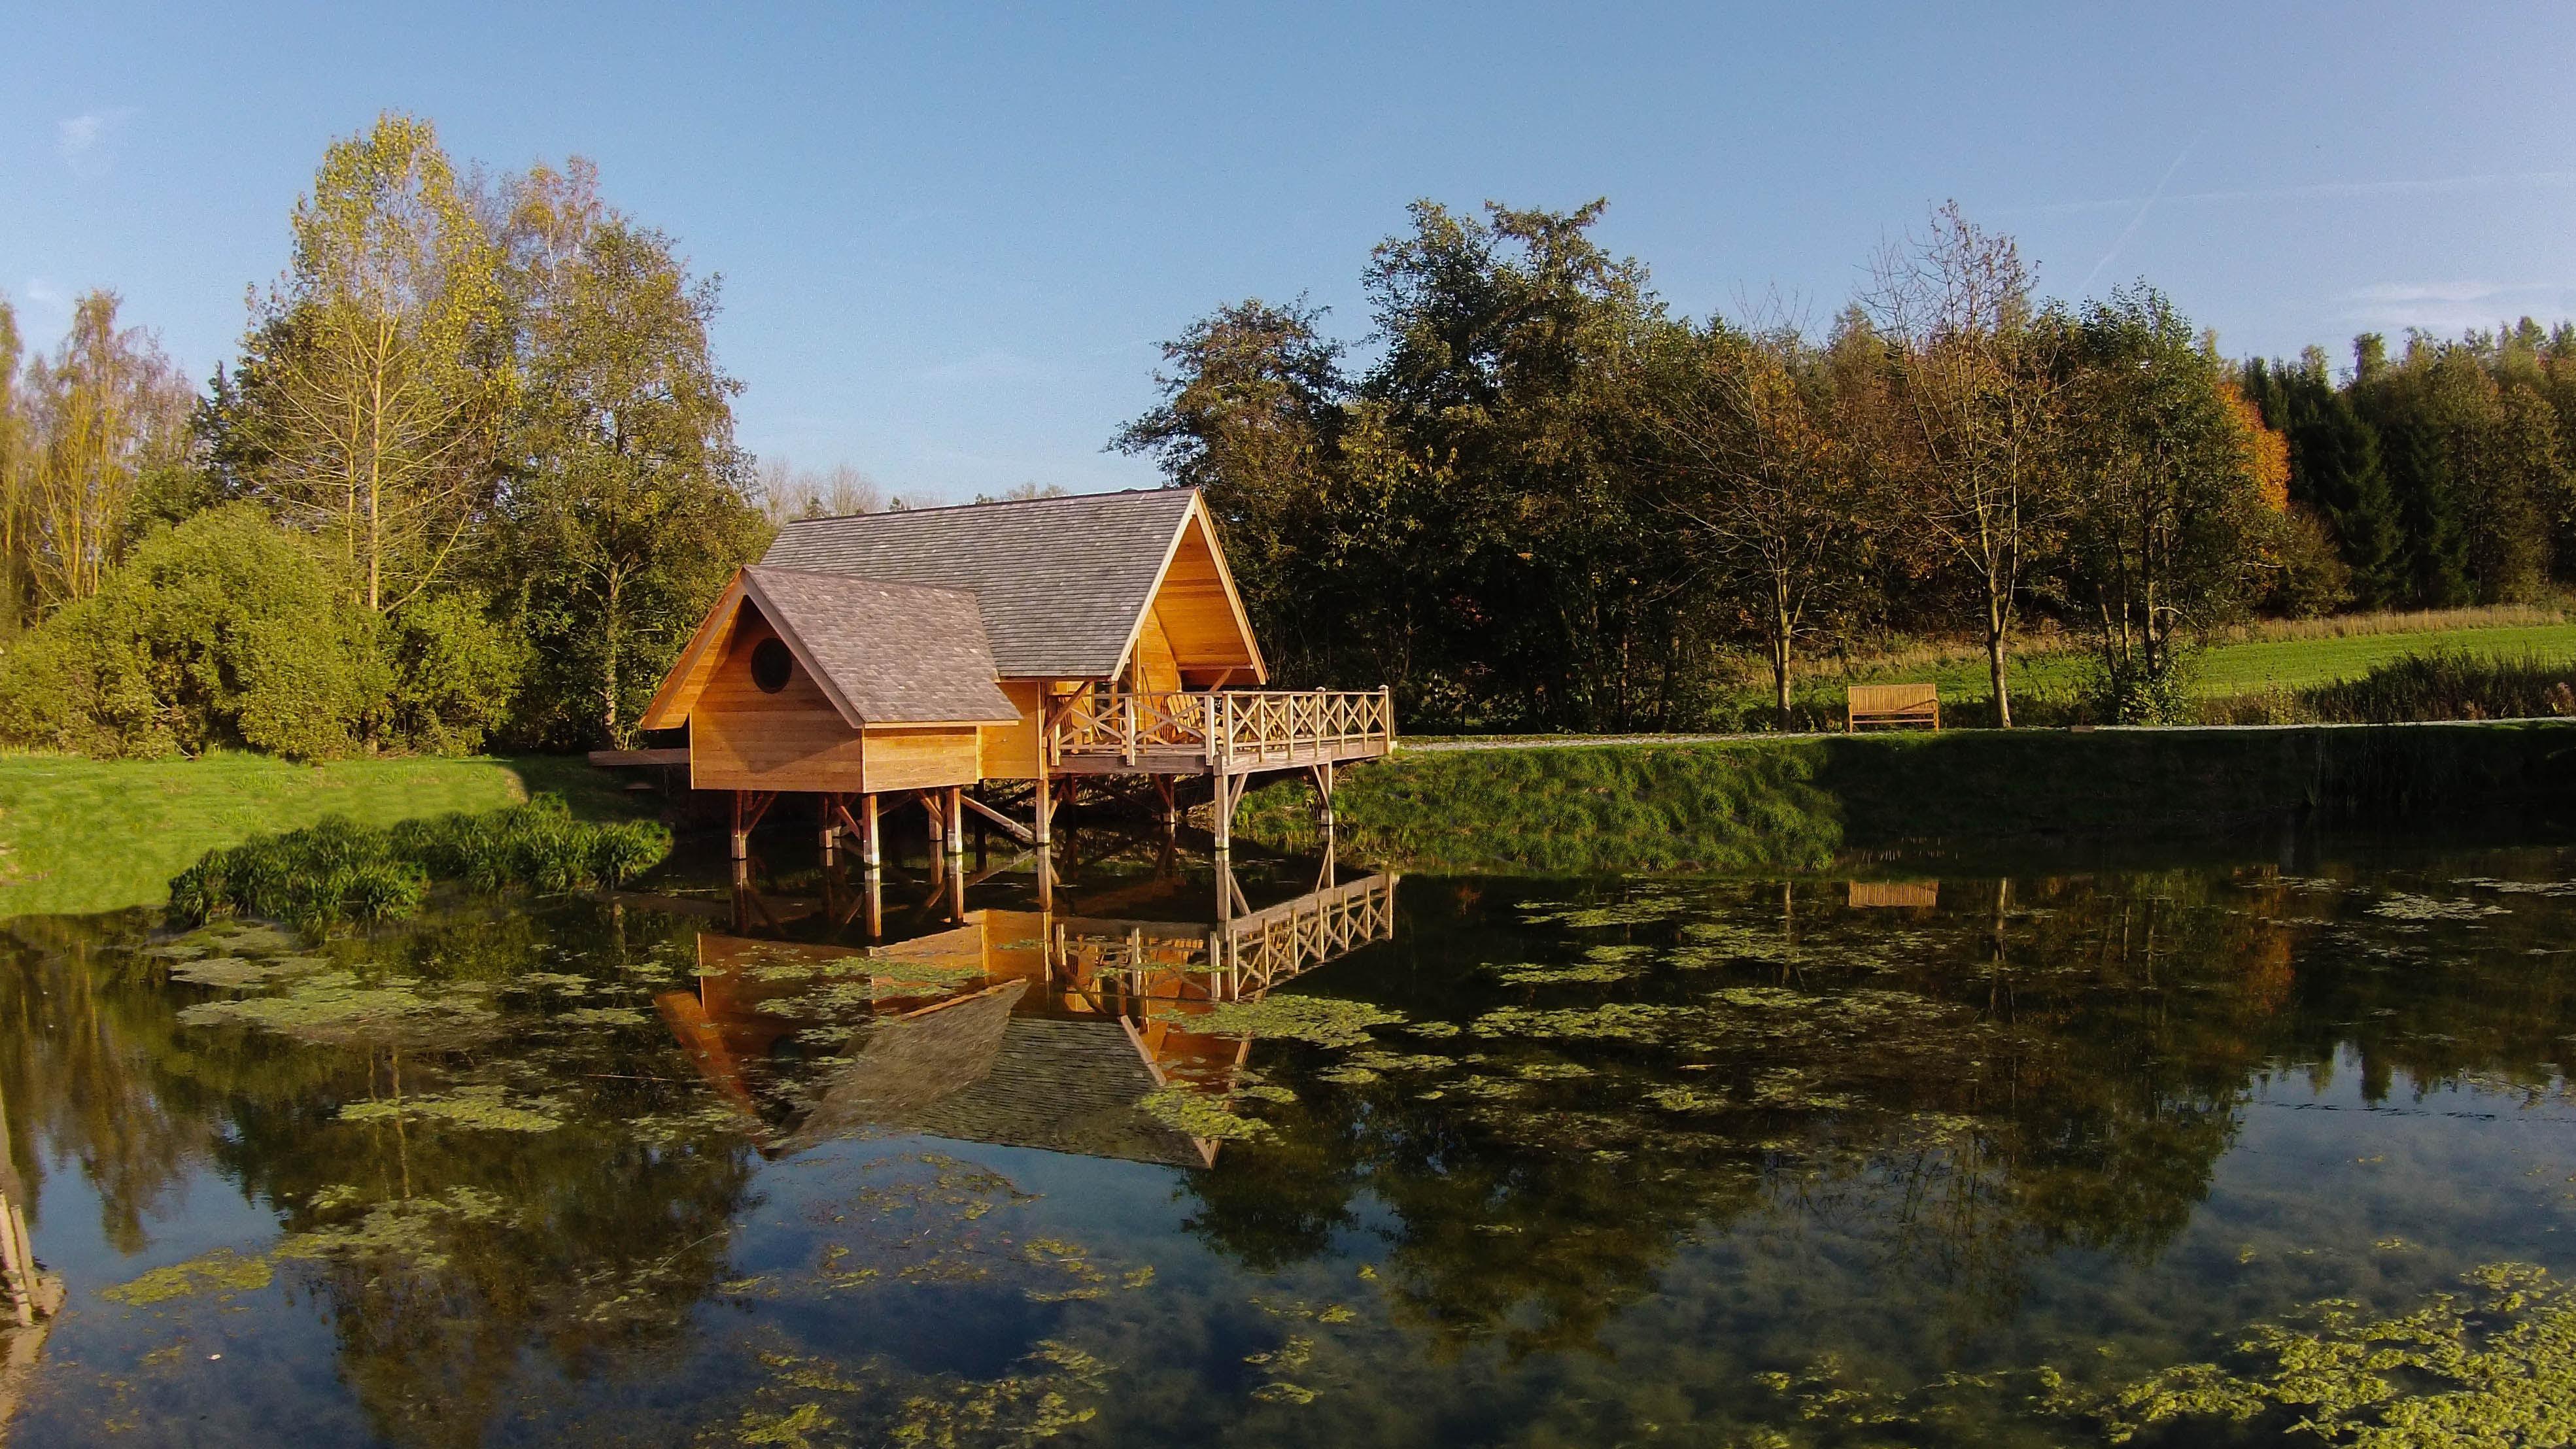 Aqualodge - tiny house